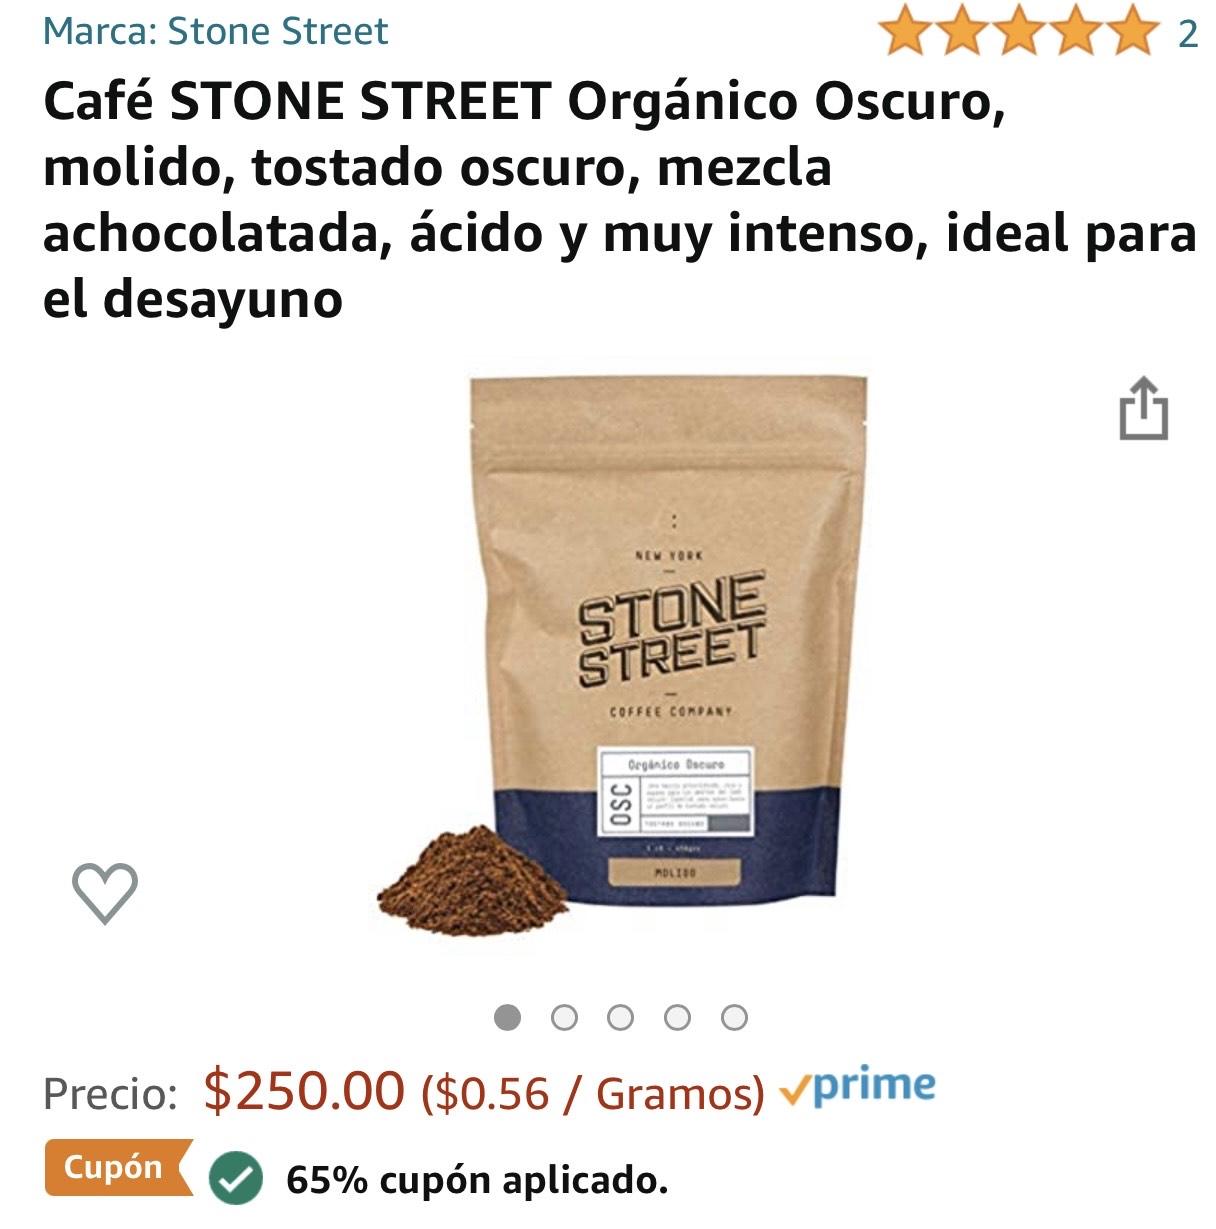 Amazon: Café STONE STREET 65%